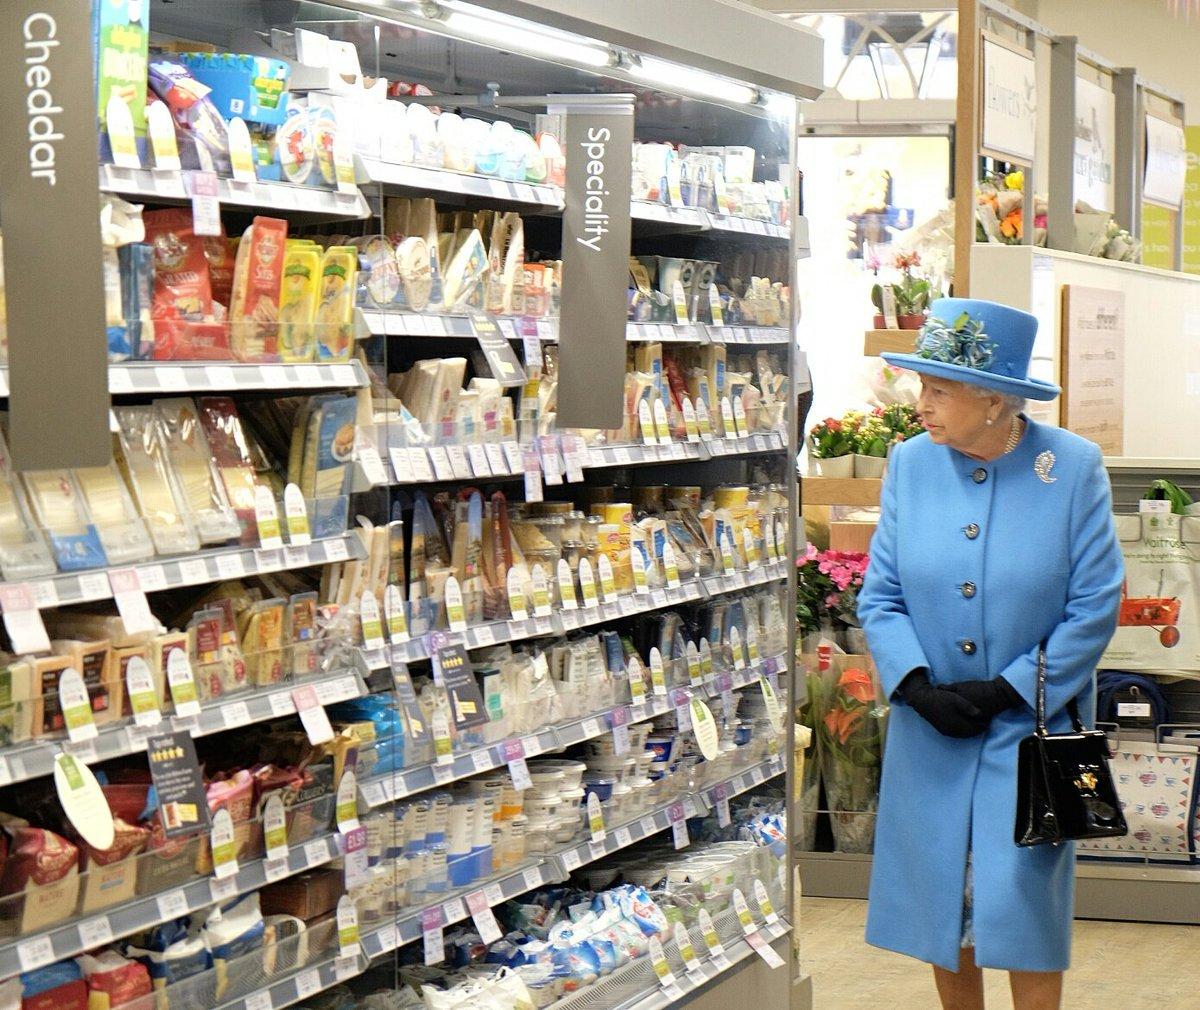 rainha-isabel-ii-supermercado